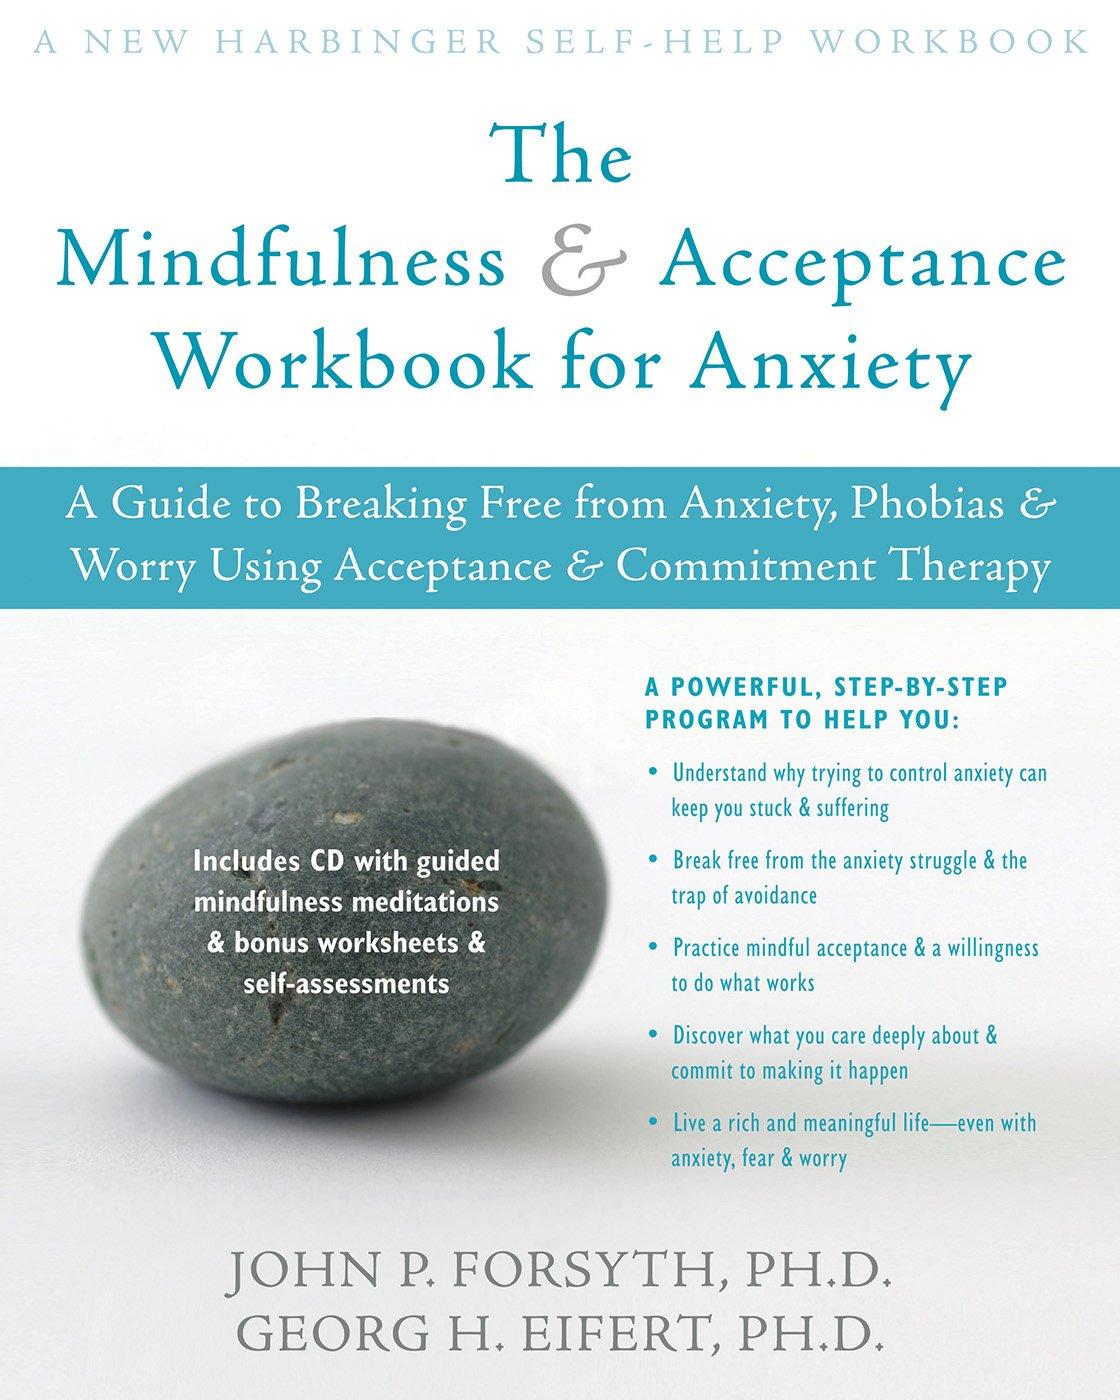 Workbooks eating disorder workbook : Calgary Silver Linings Foundation - Workbooks on Eating Disorders